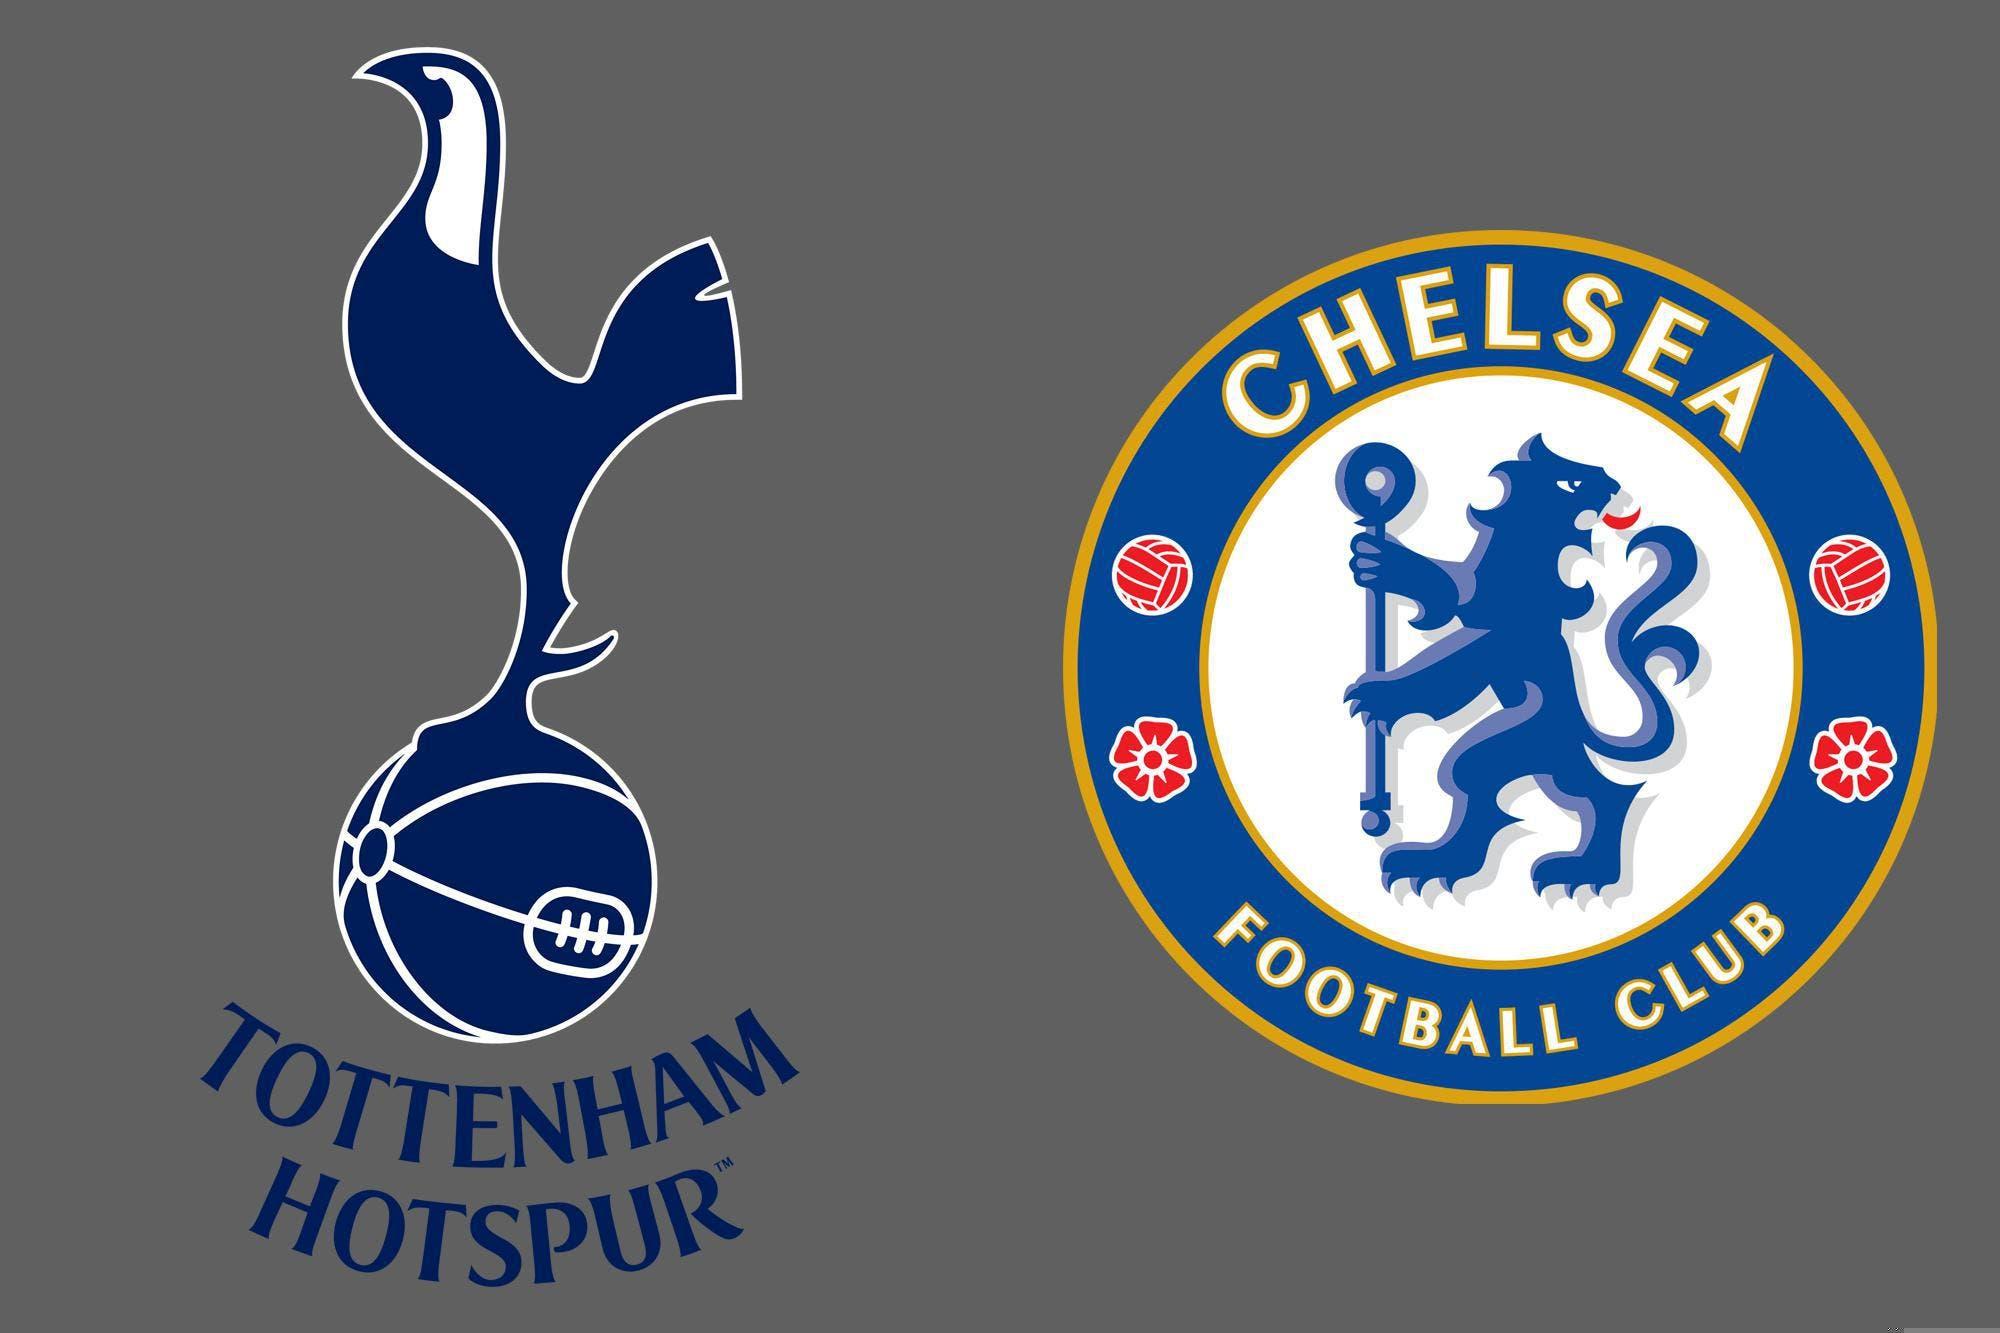 Premier League de Inglaterra: Chelsea venció por 1-0 a Tottenham como visitante